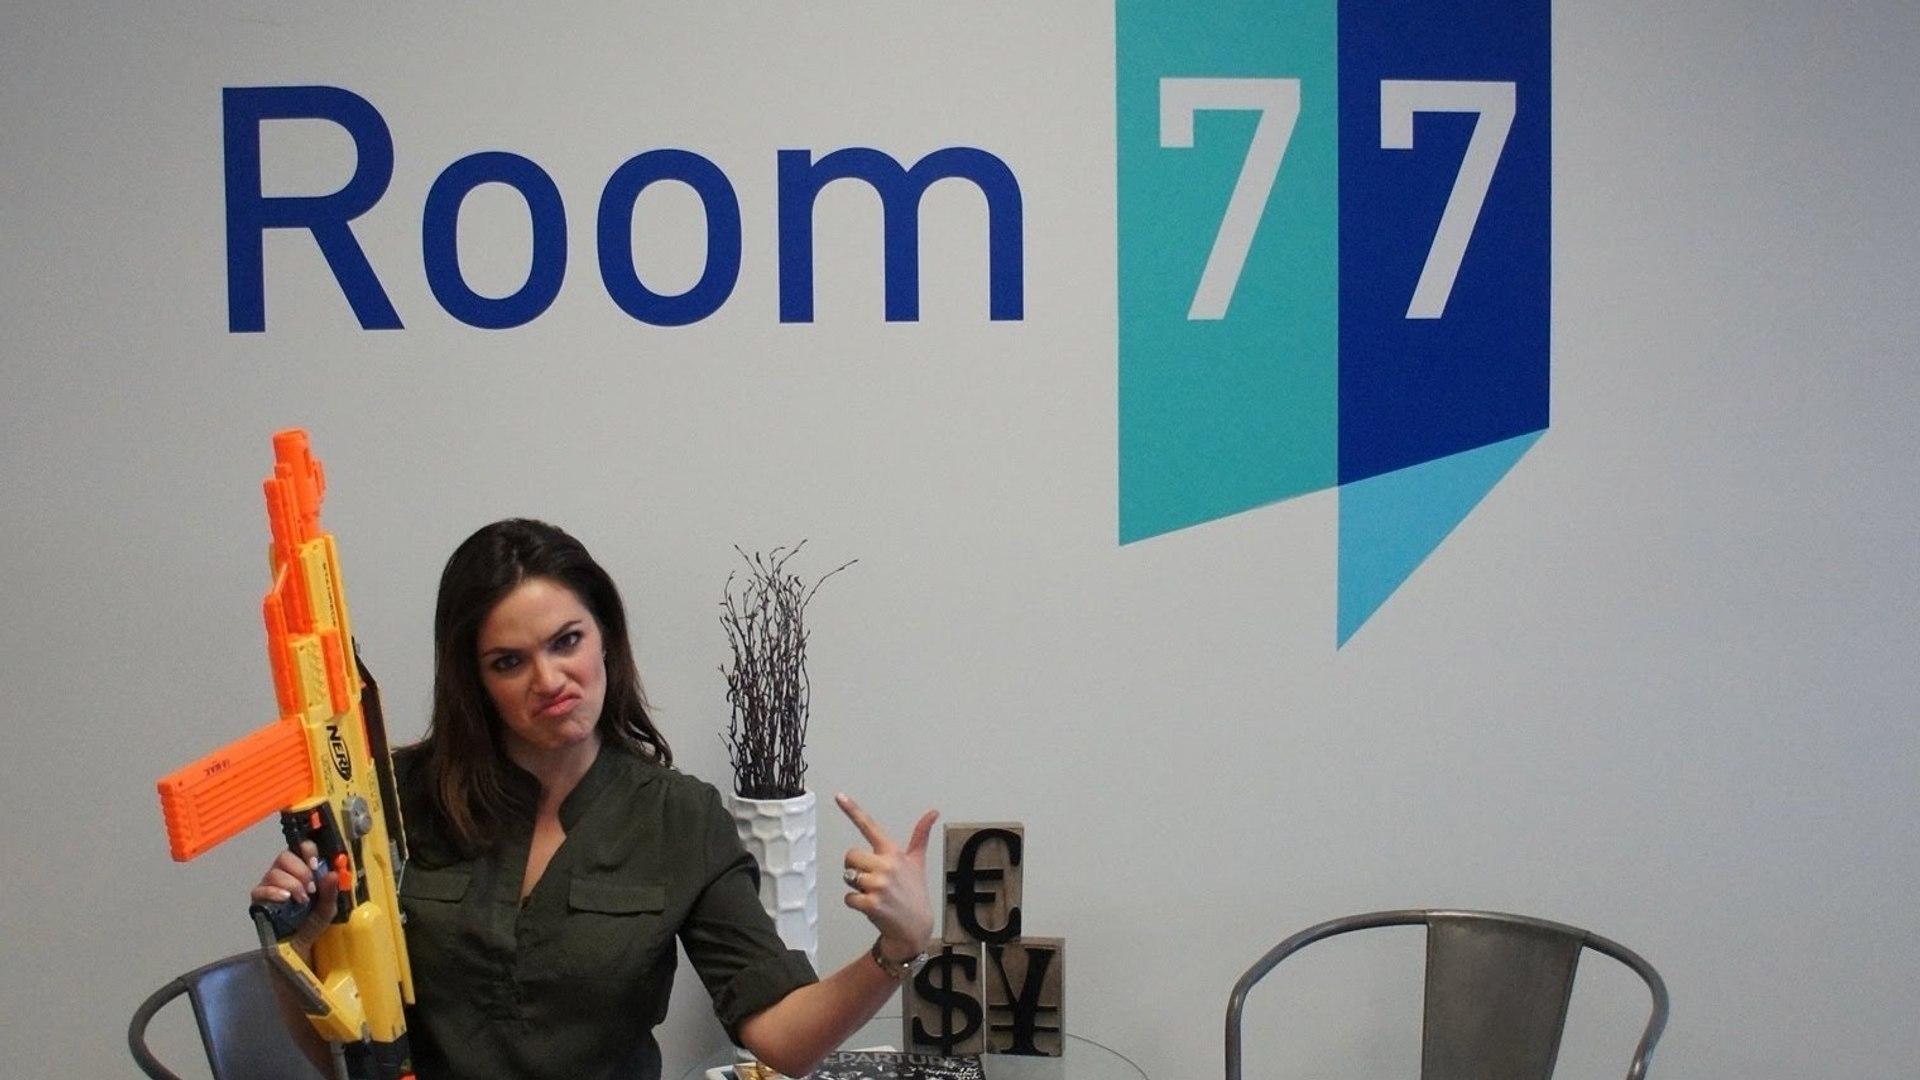 Behind the Scenes at Room77